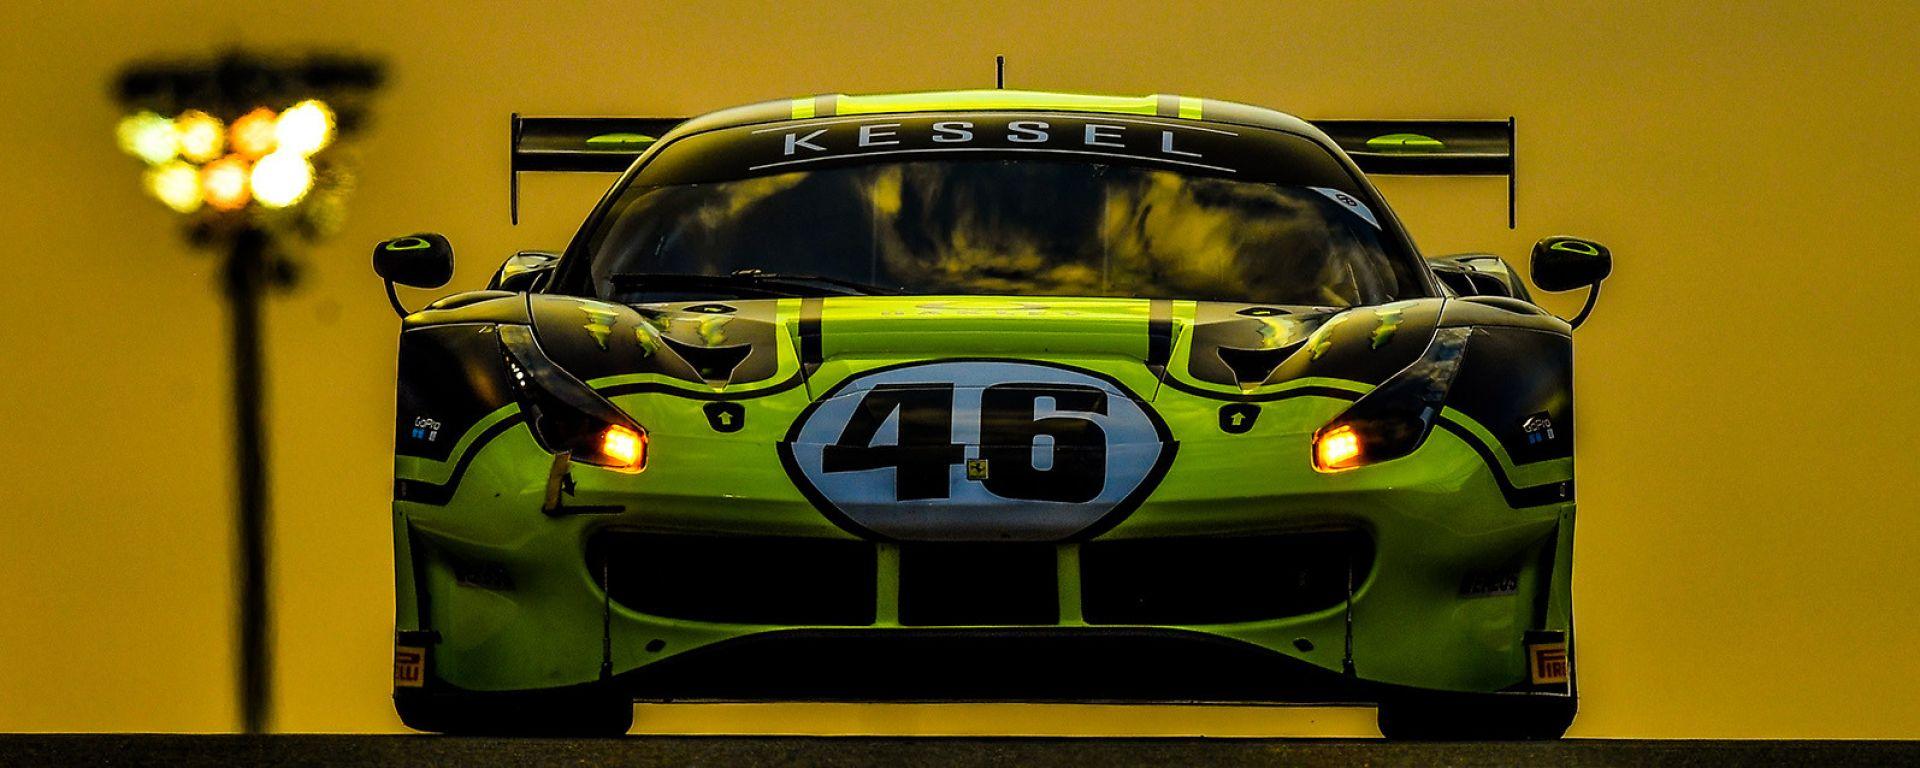 Valentino Rossi (Ferrari 488 GT3 - Monster VR46 Kessel), 12 ore del Golfo 2019